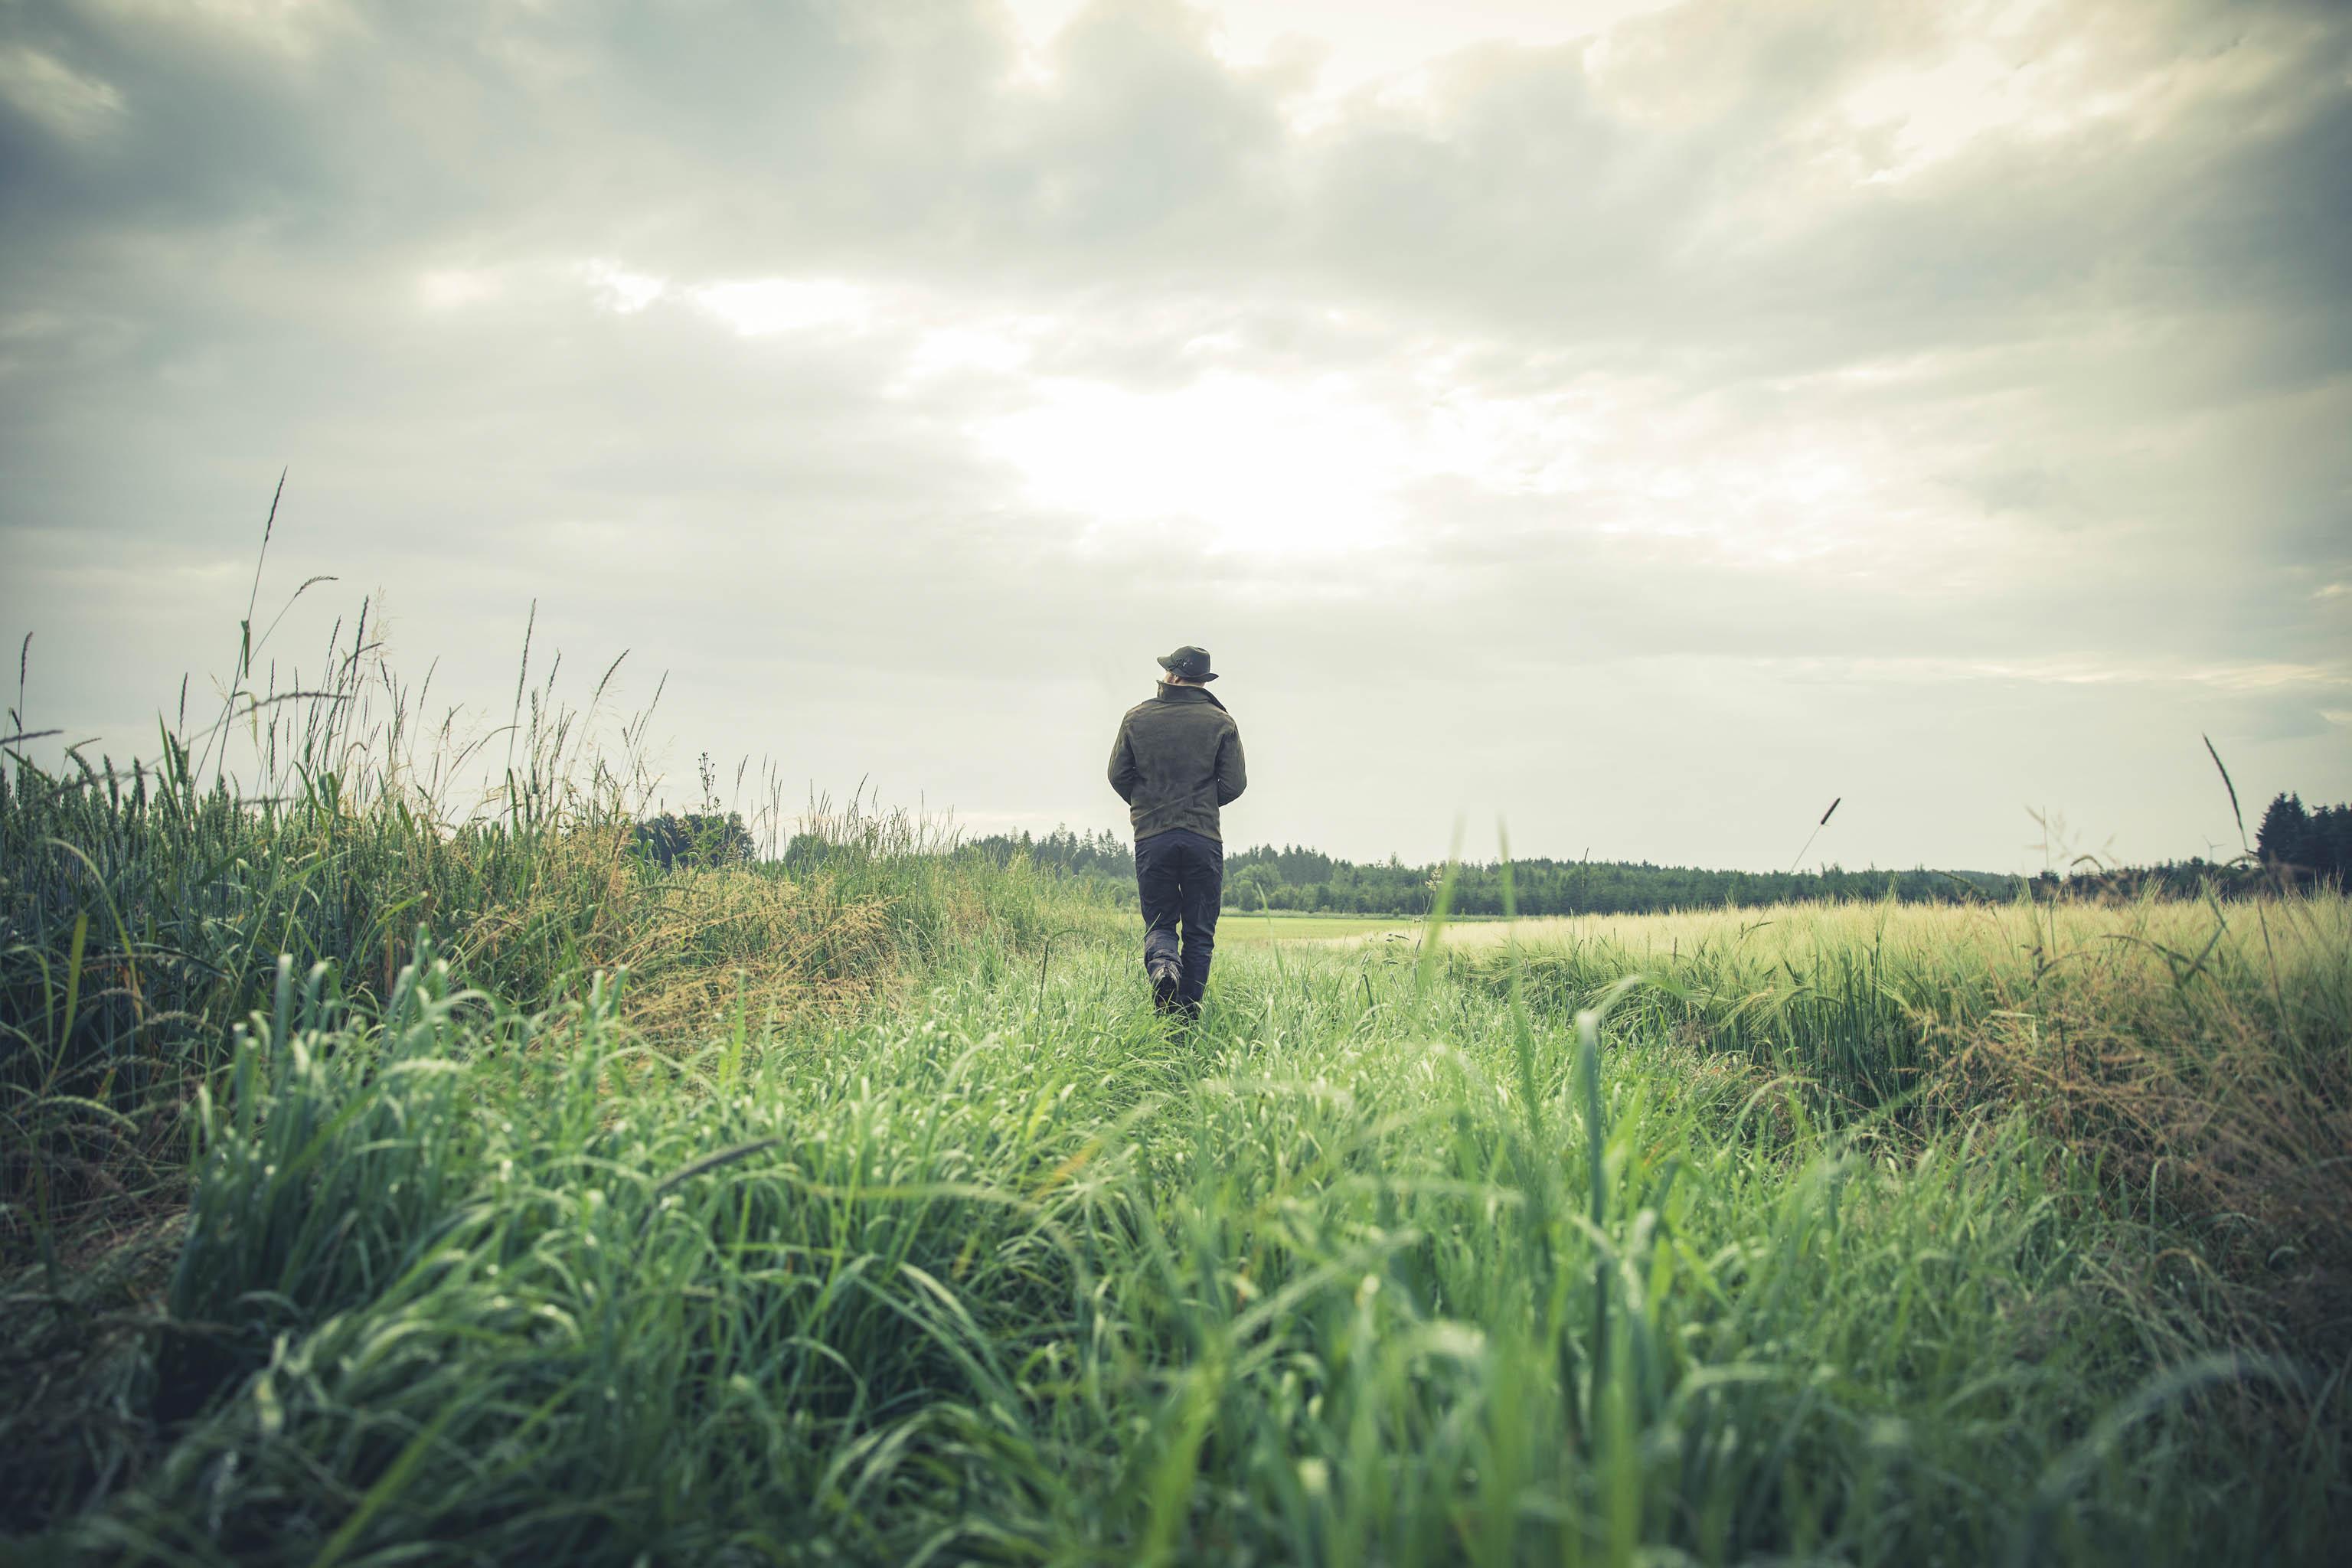 Wildlife photography stalking tips